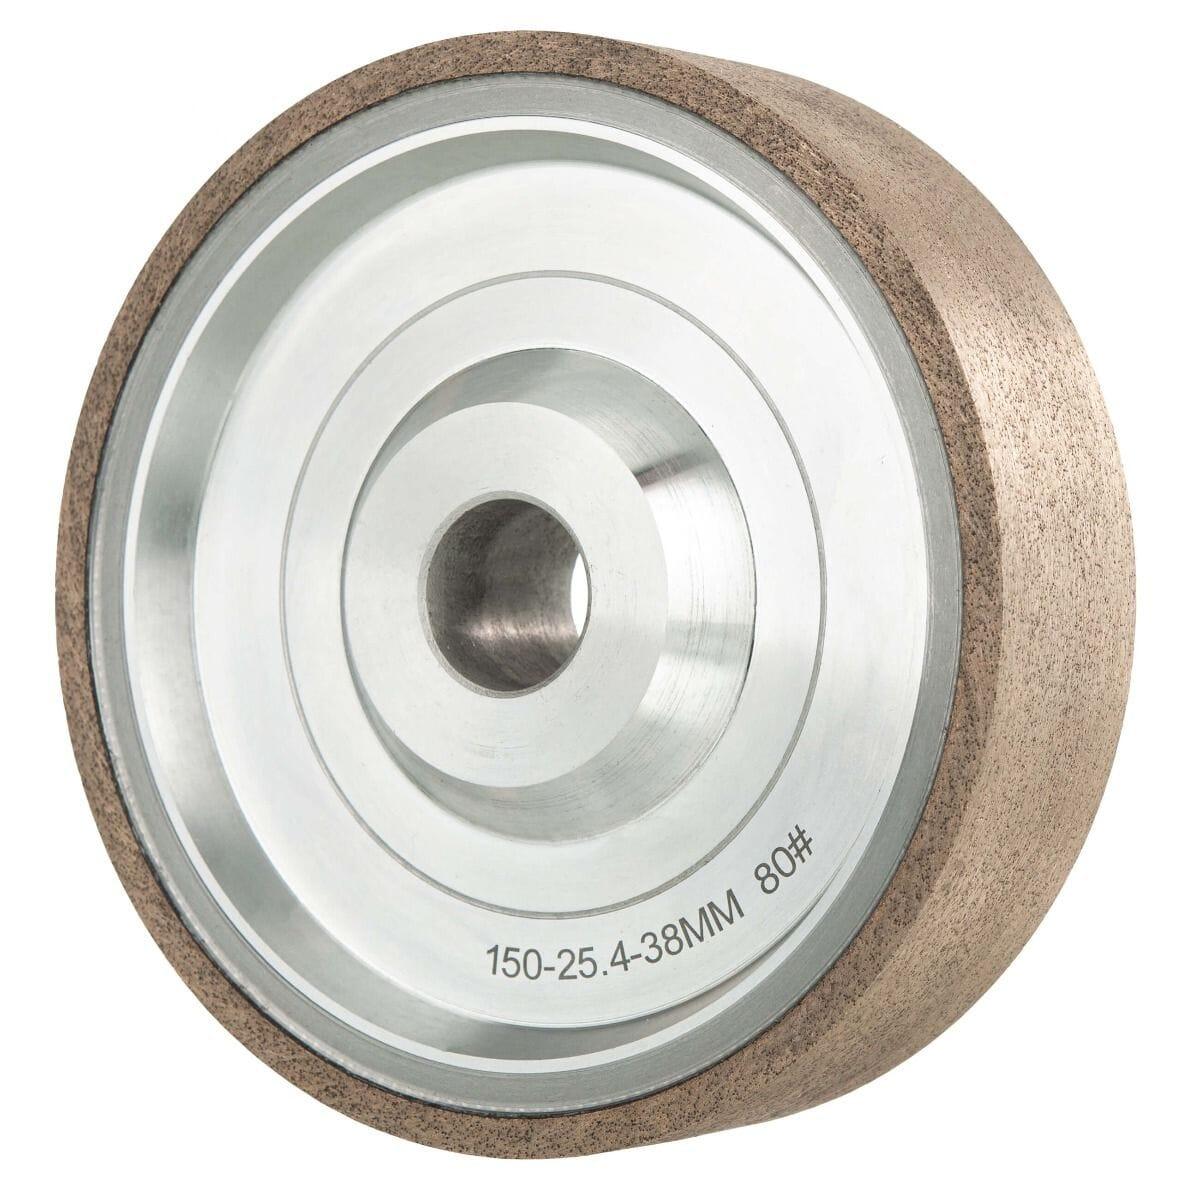 12 Grinding Wheel Reducing Bushes Mixed Sizes Set